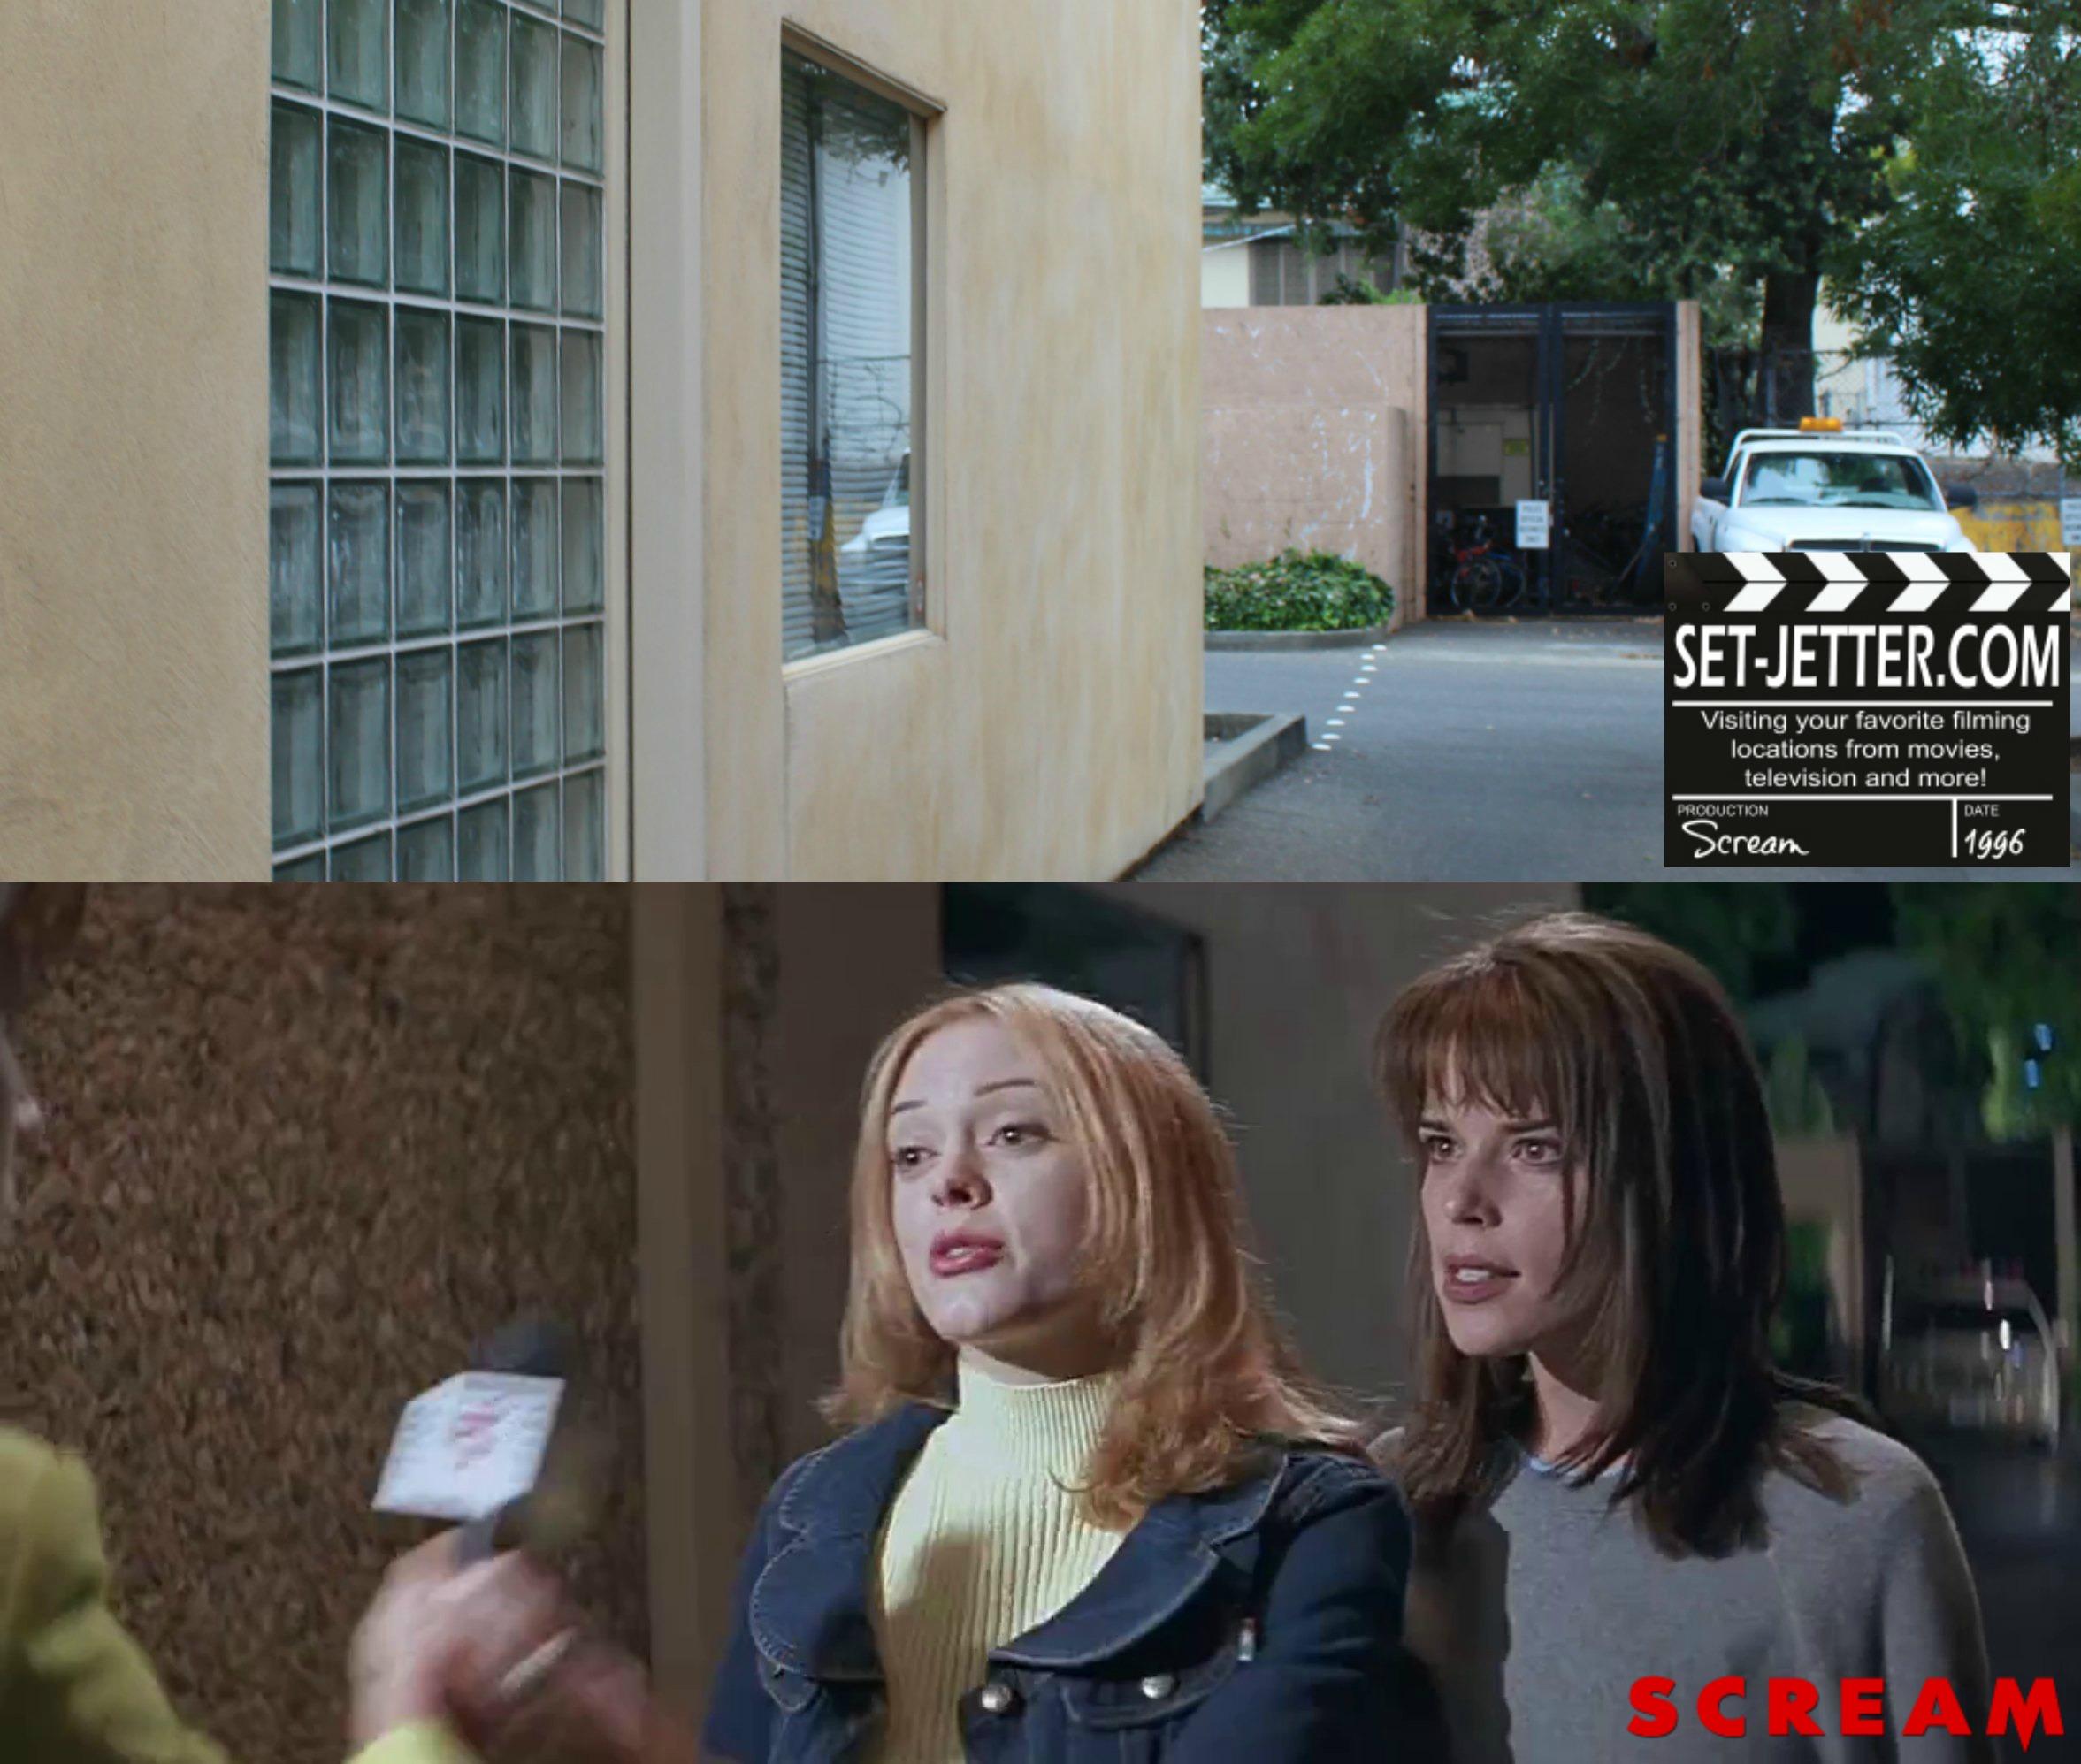 Scream comparison 62.jpg